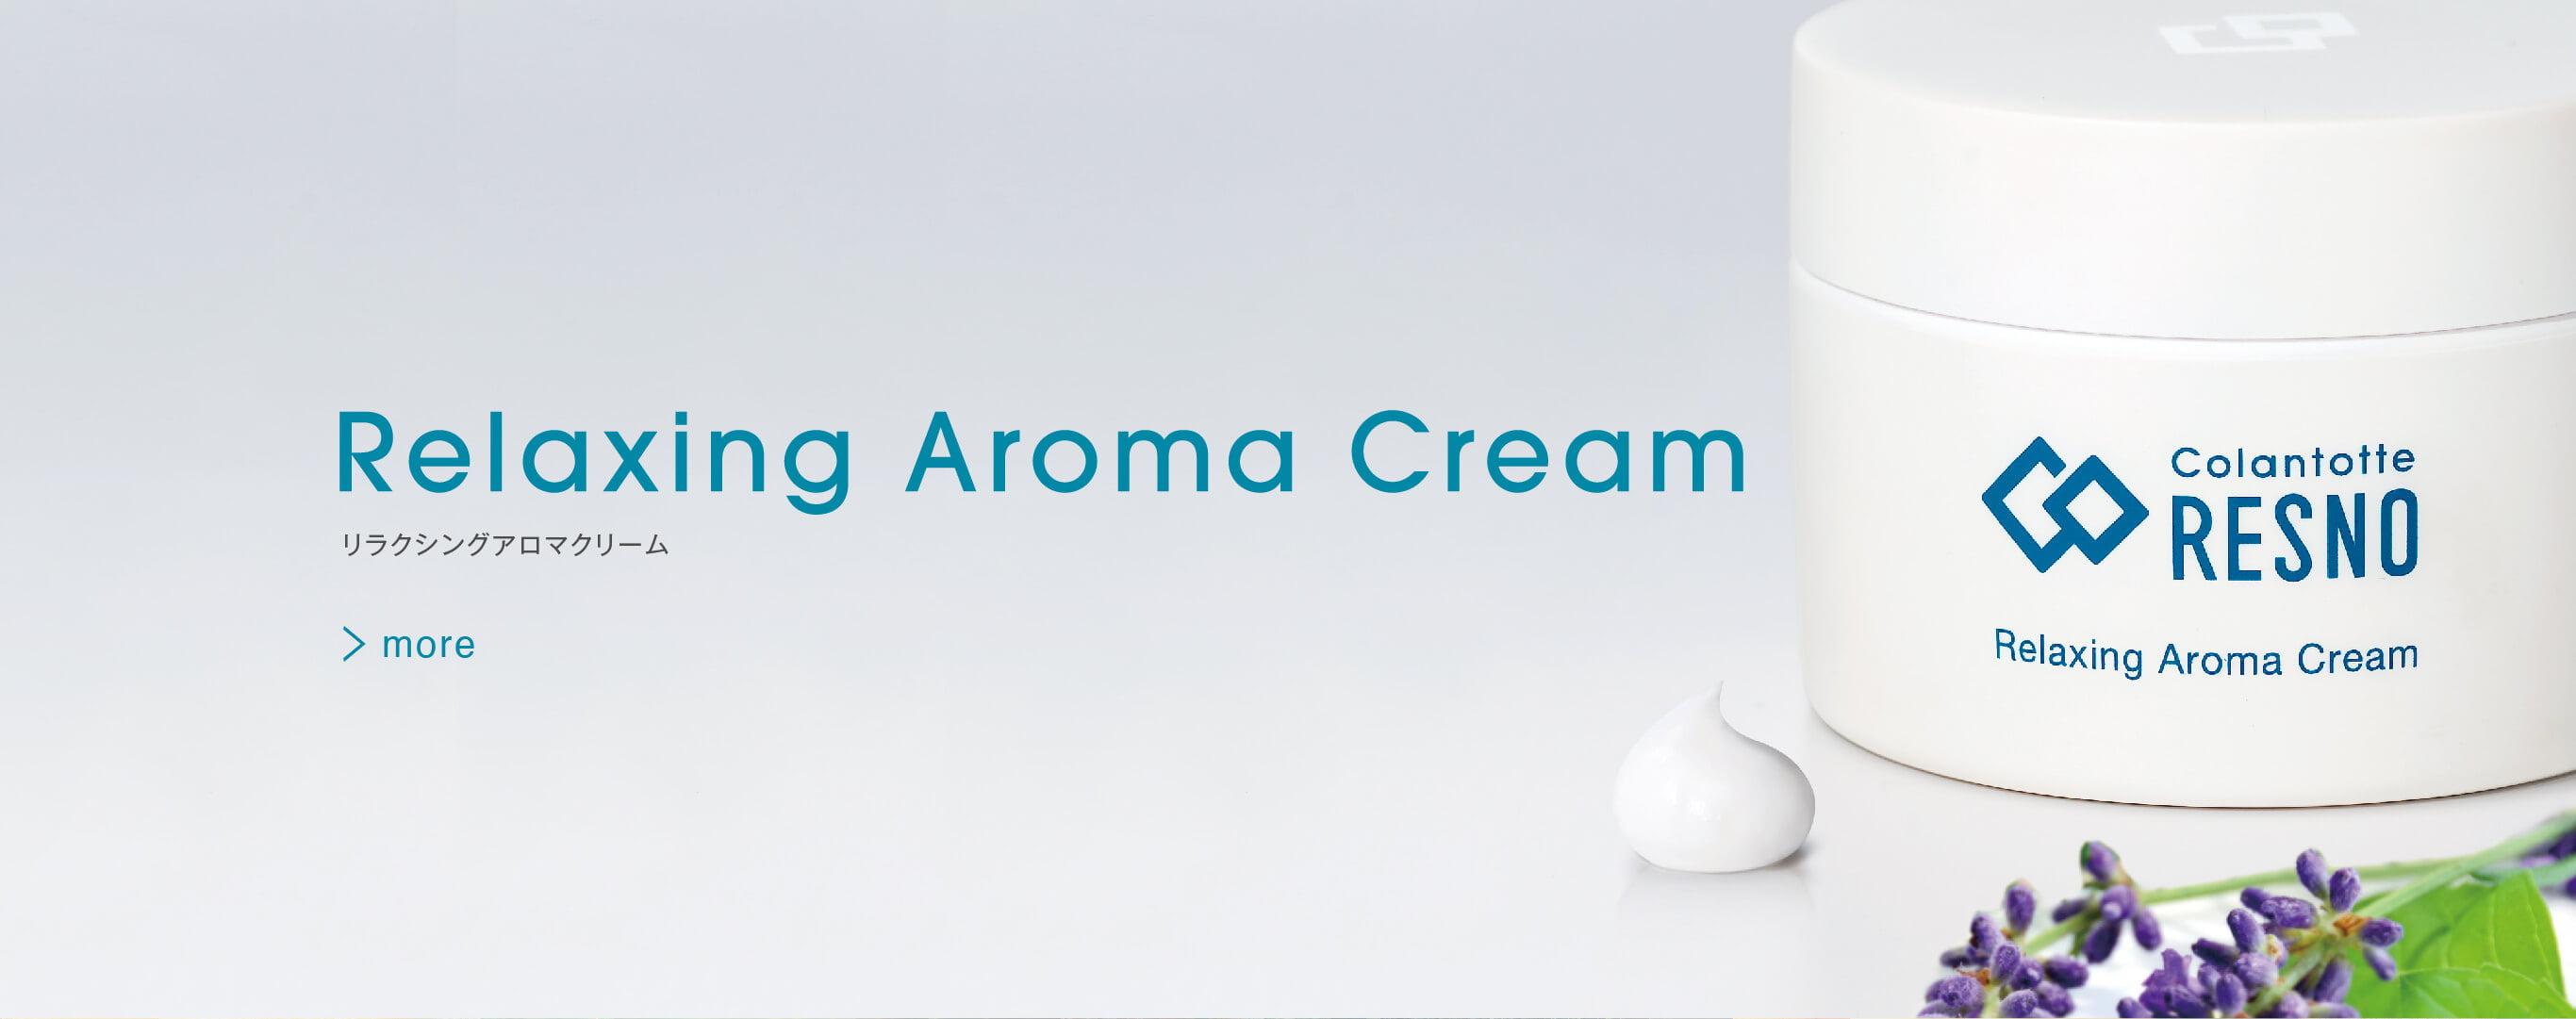 Relaxing aroma cream リラクシングアロマクリーム